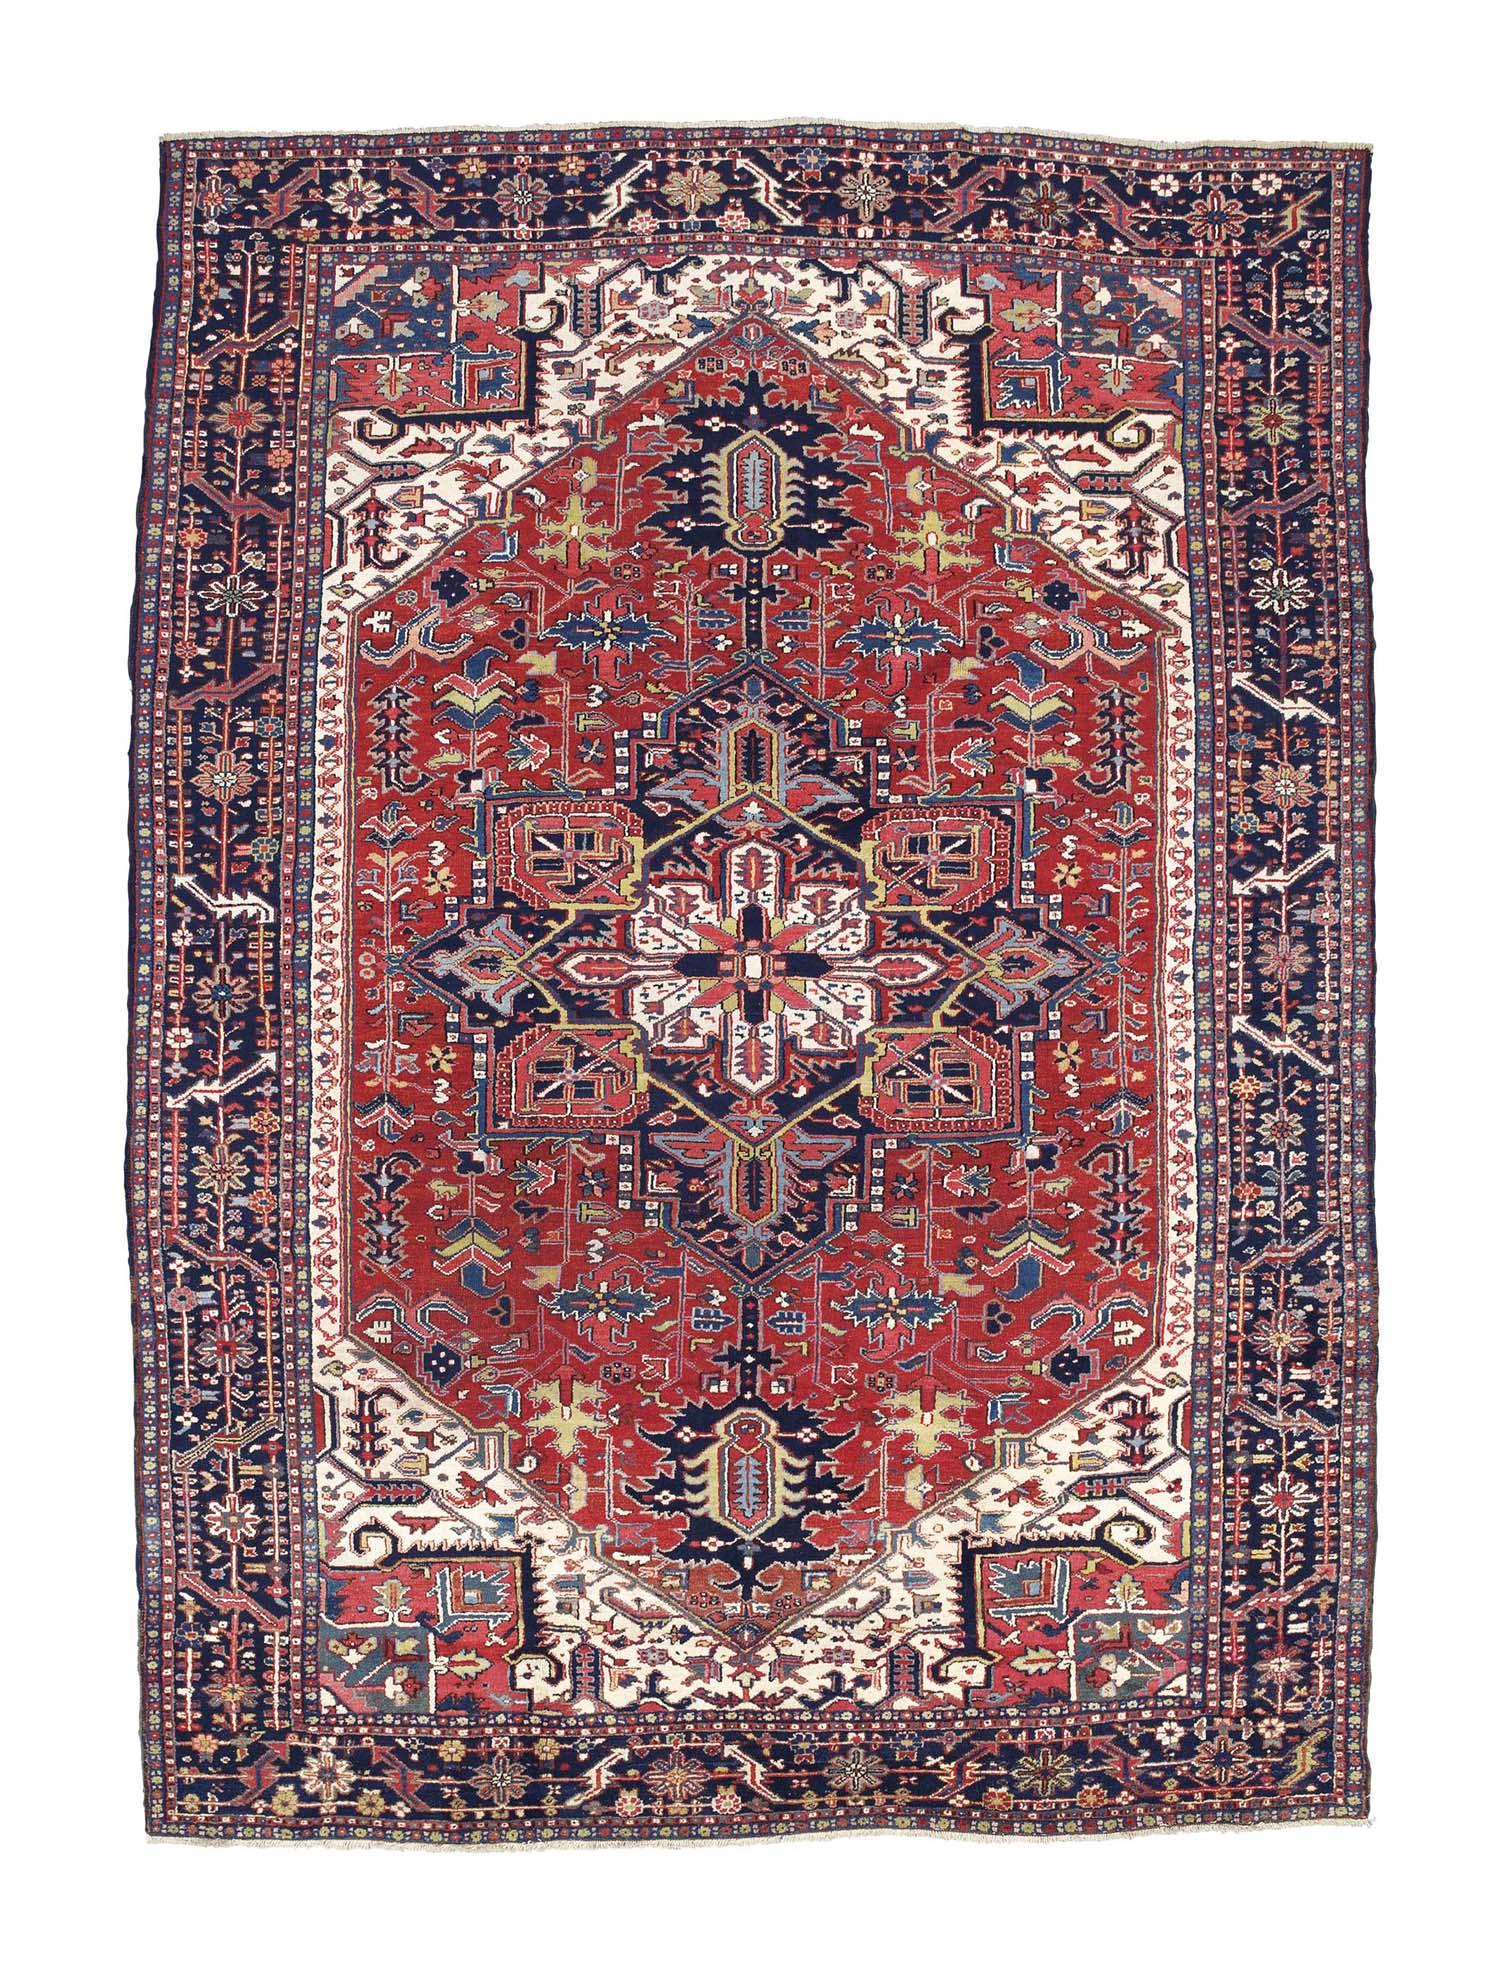 A fine Karaja carpet